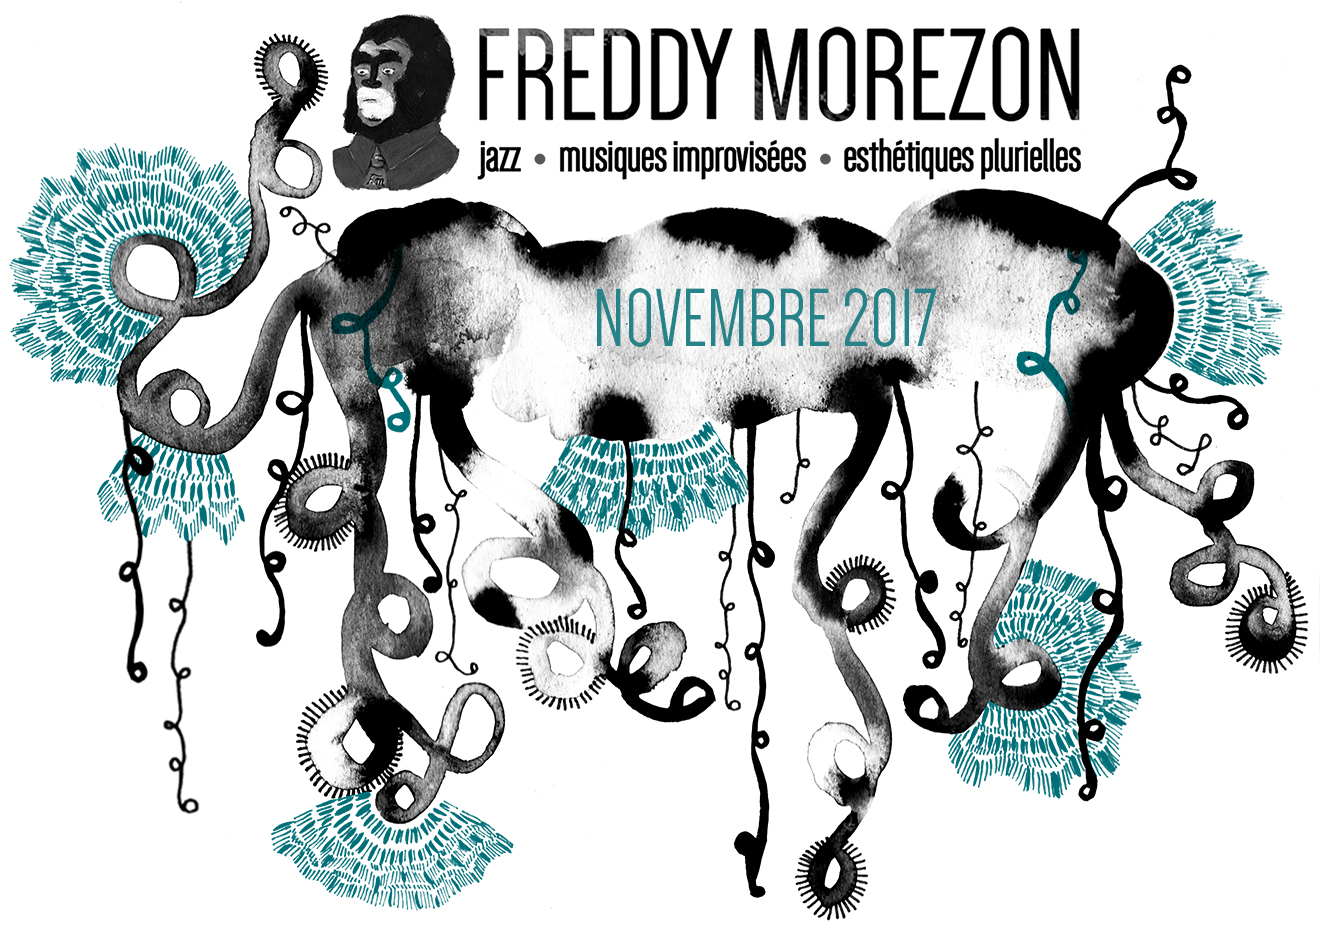 Freddy Morezon - Newsletter novembre 2017